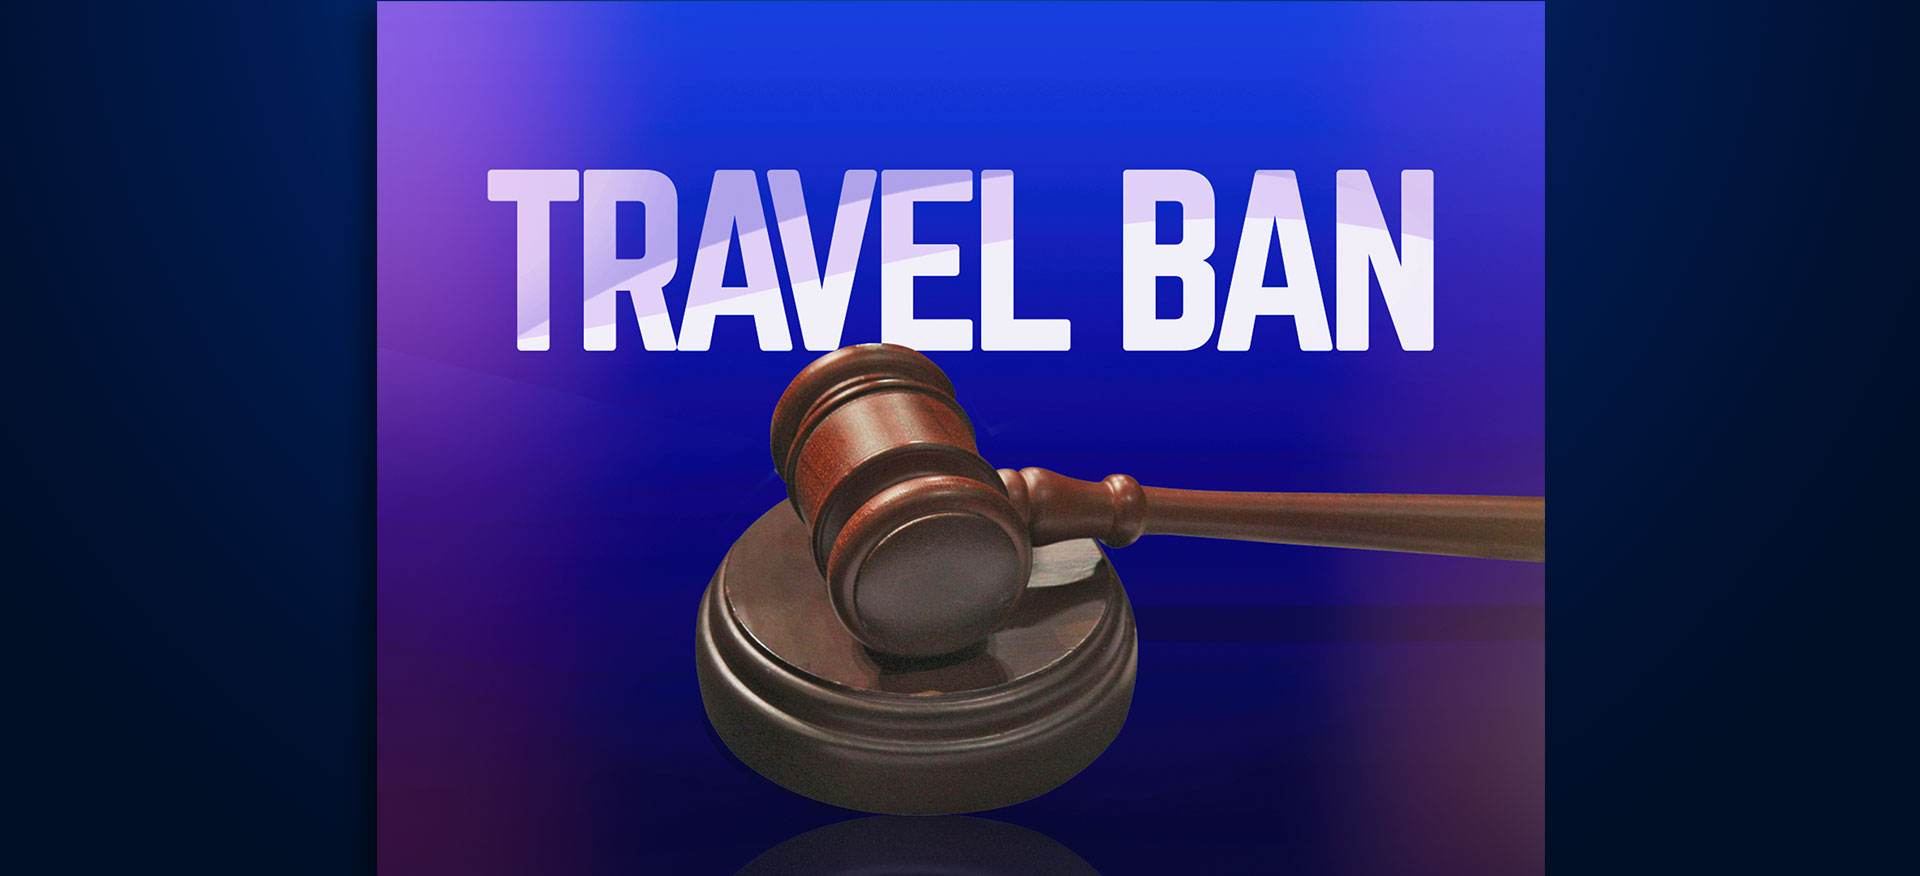 Travel Ban On Friday